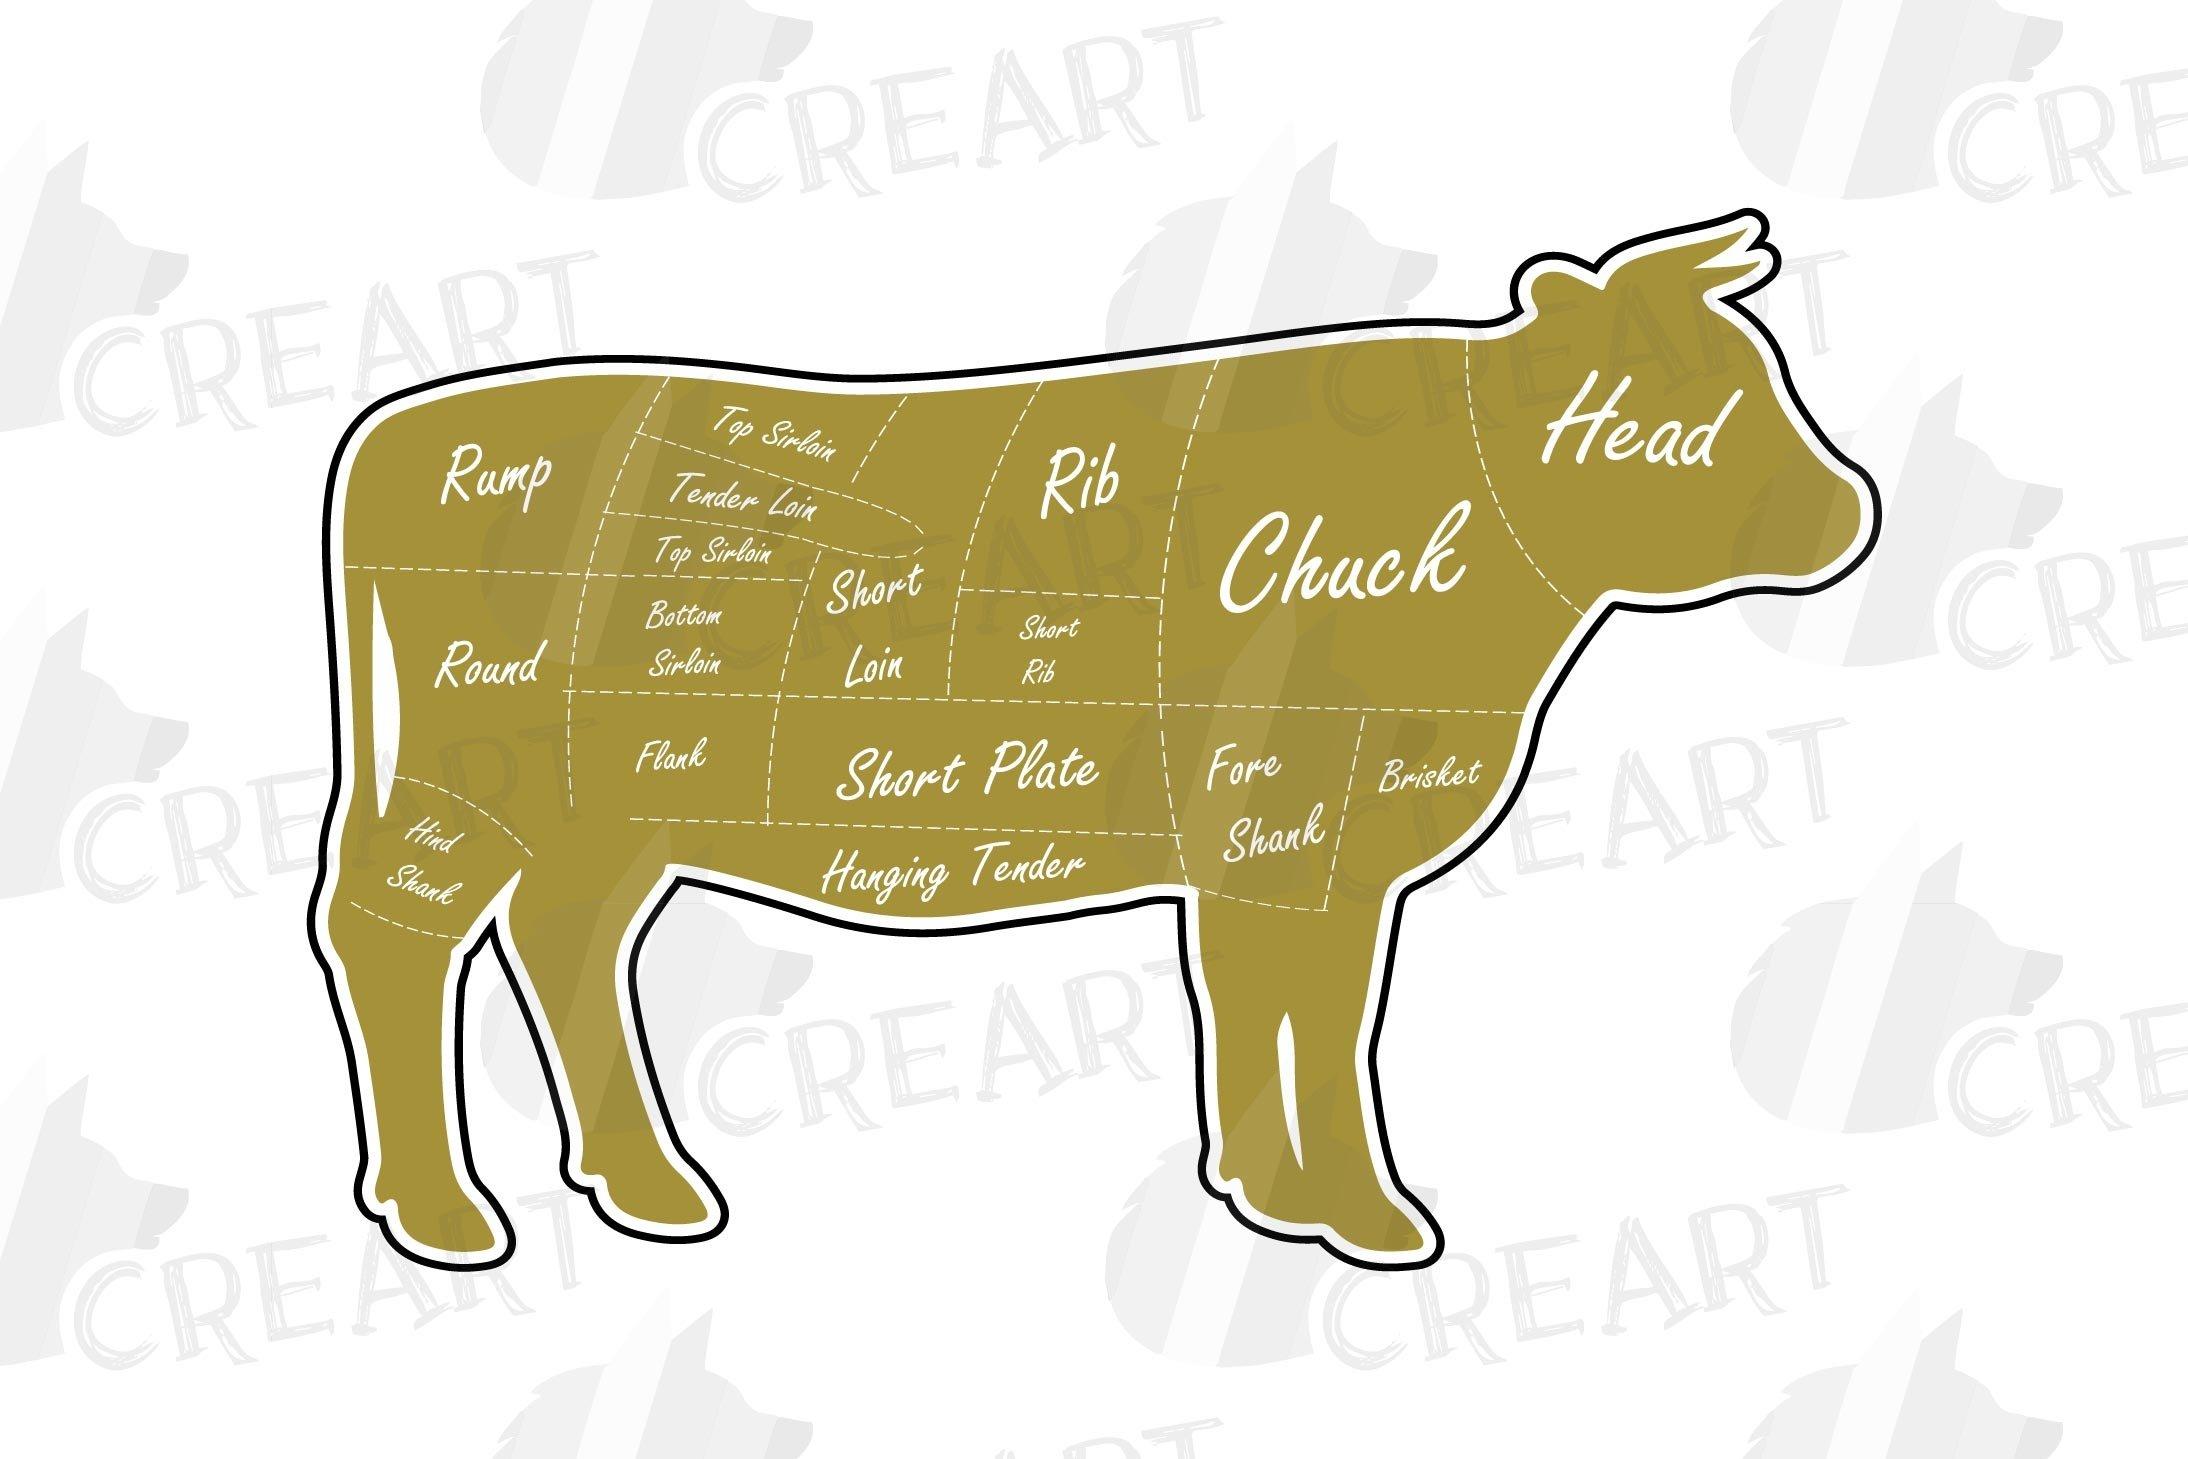 Download Butcher Diagram Clipart Cuts Of Meat Lamb Beef Pork Chic 108117 Illustrations Design Bundles